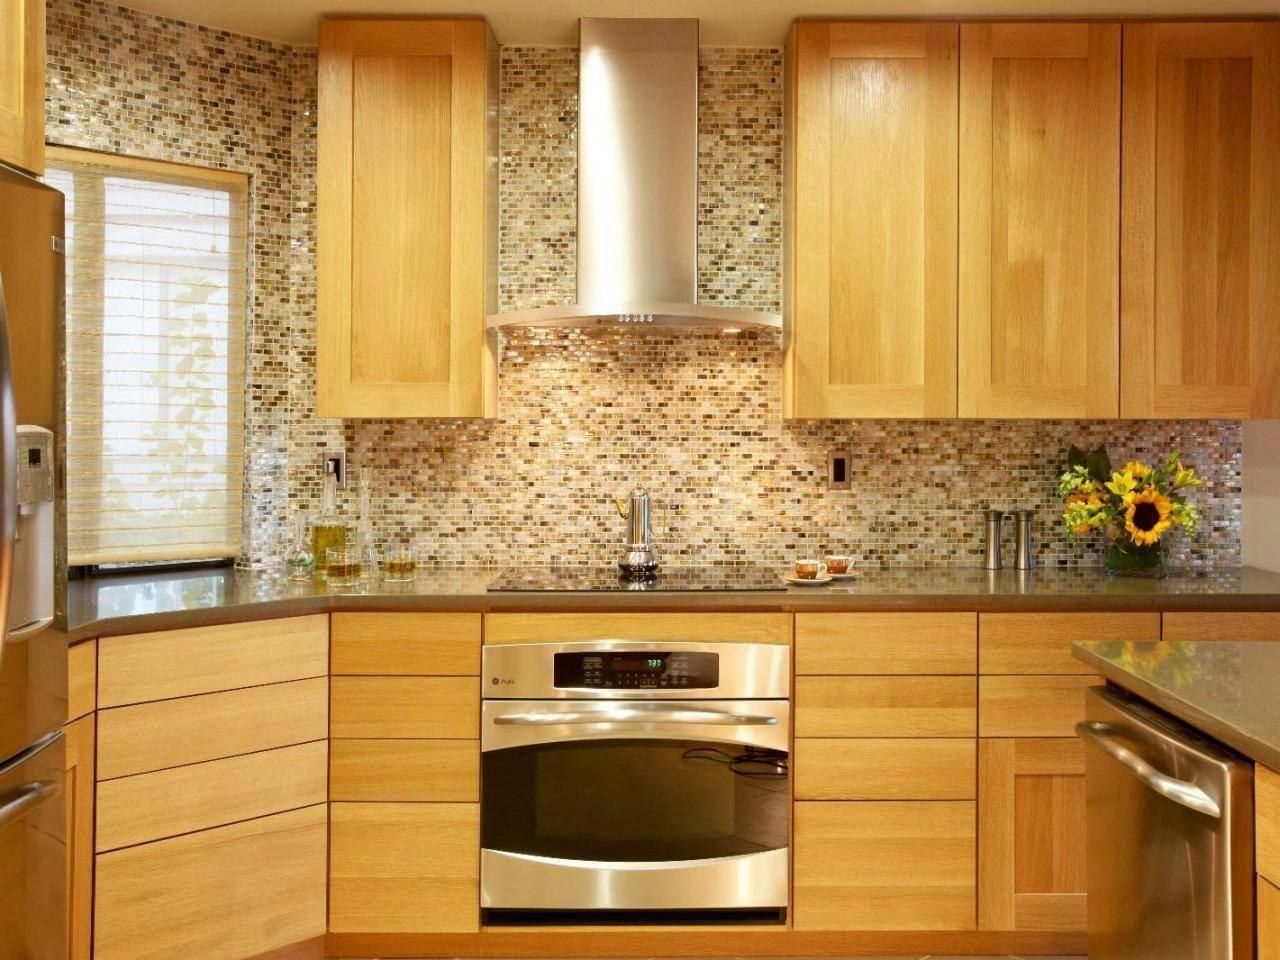 Hgtv Kitchen Backsplash Ideas Download Painting Kitchen Backsplashes Ideas From Hgtv From In 2020 Kitchen Backsplash Designs Hgtv Kitchens Country Kitchen Backsplash